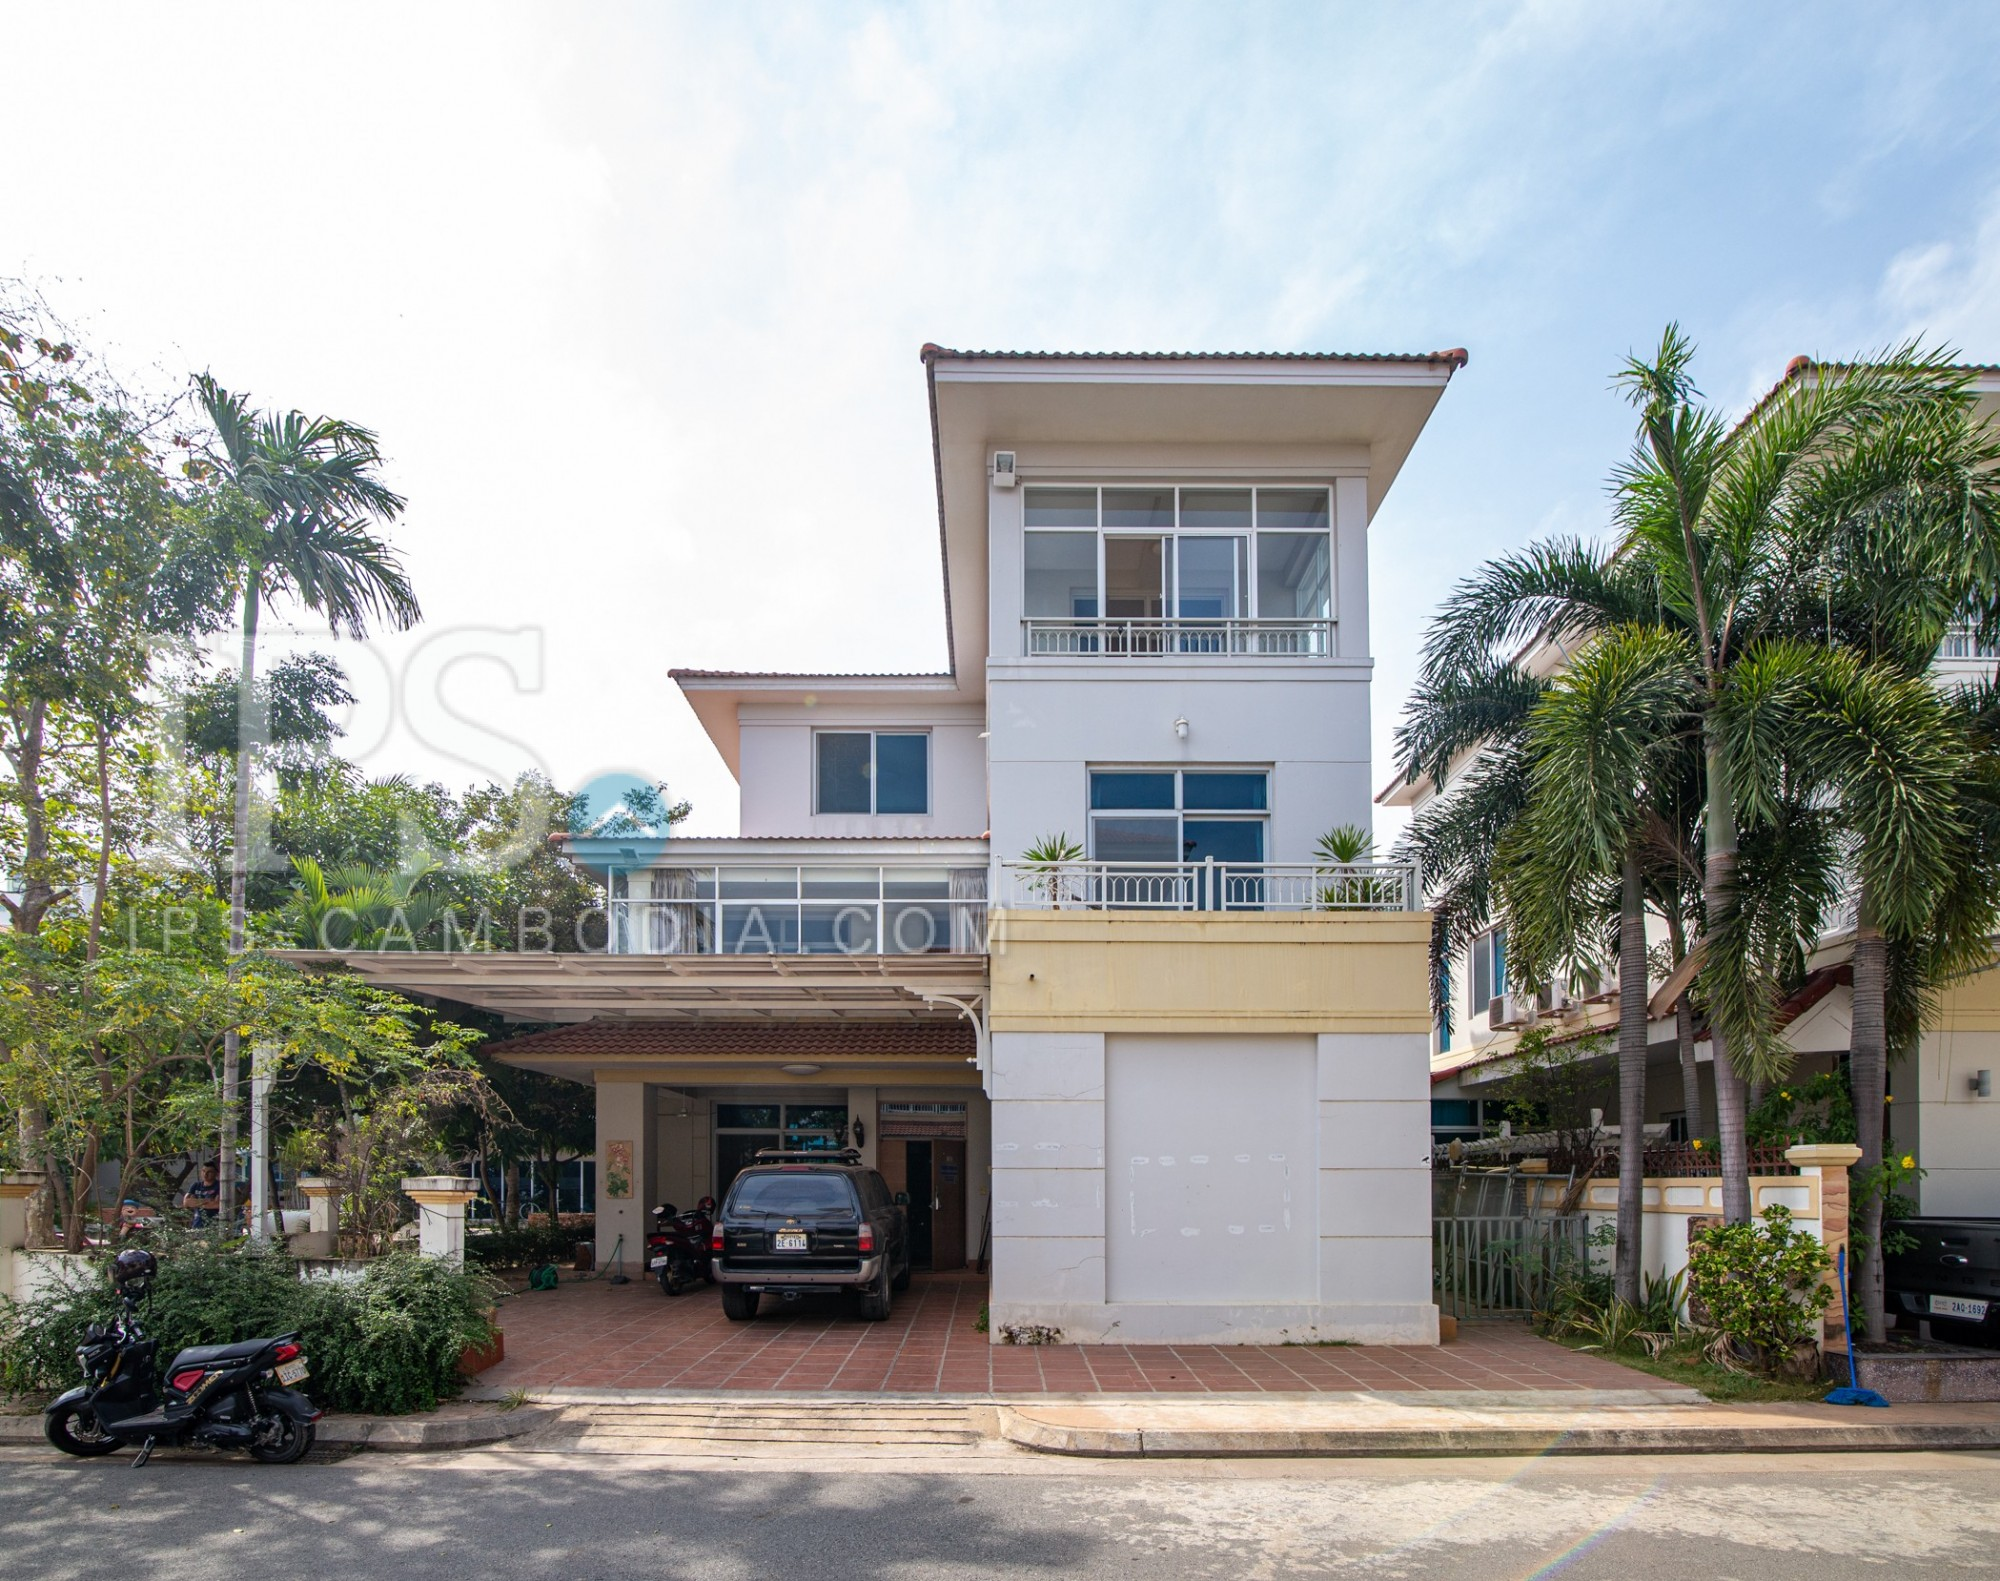 4 Bedroom Villa For Rent - Boeung Kak 1, Toul Kork, Phnom Penh